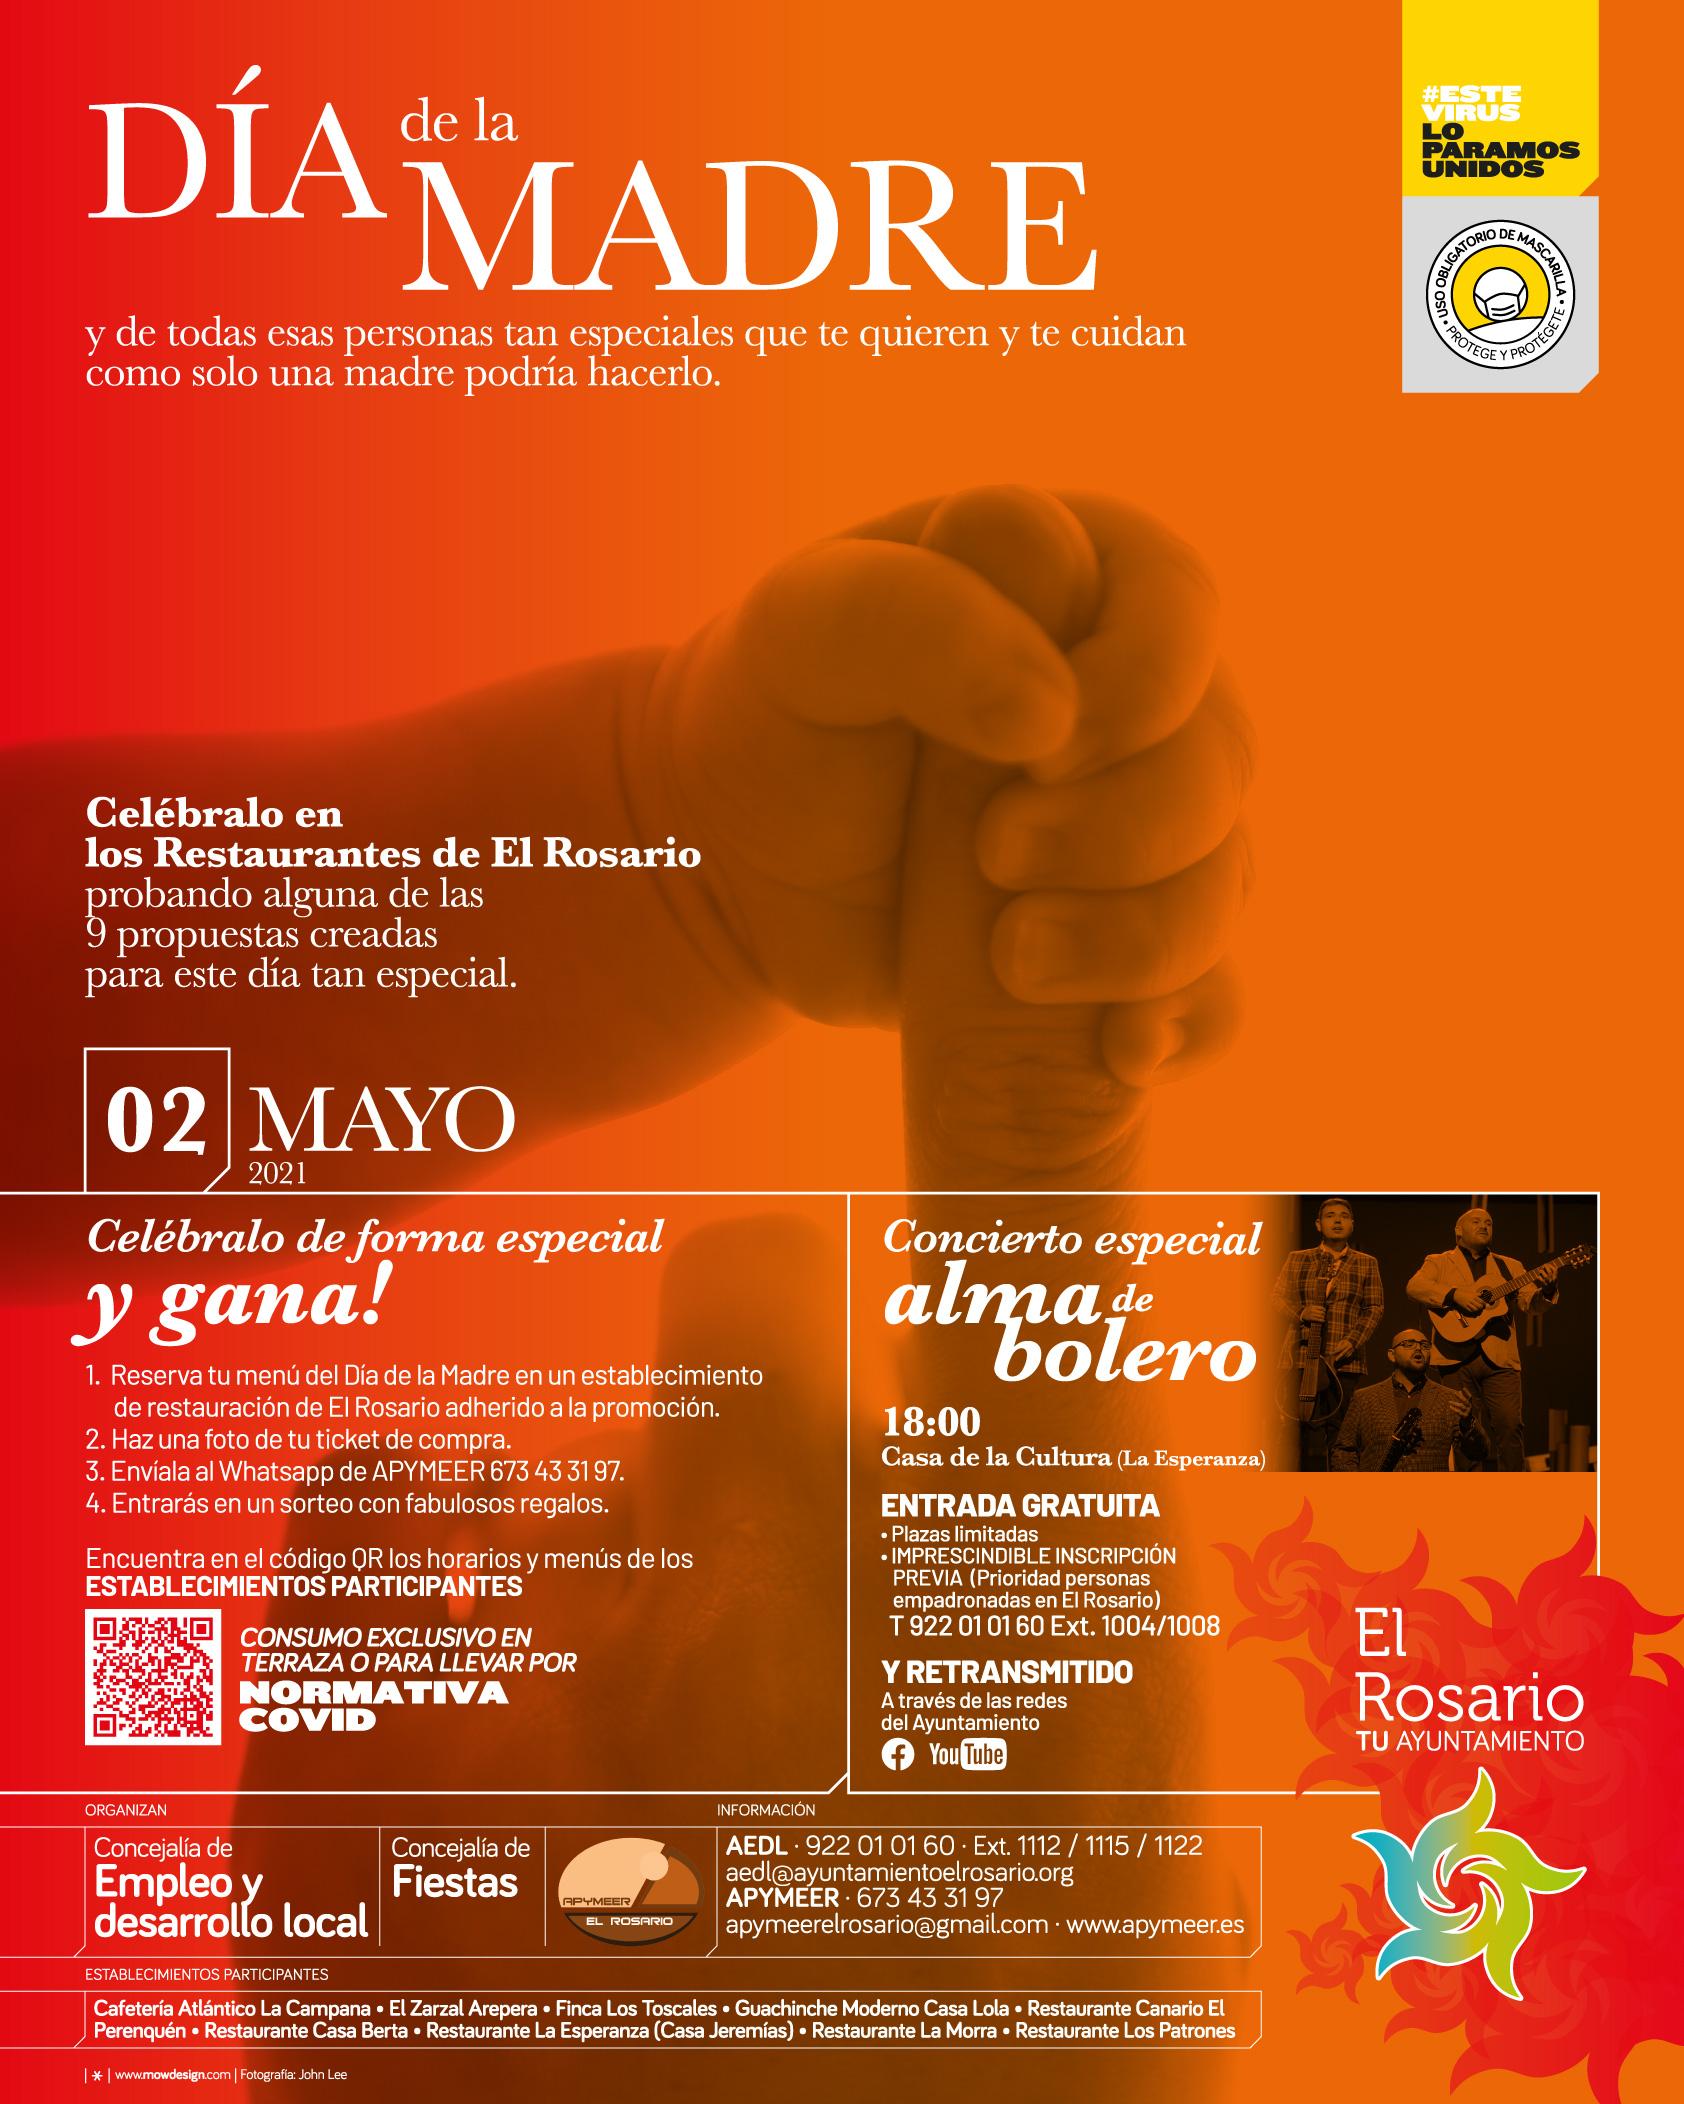 DIA_DE_LA_MADRE-20210502-CARTEL_A3-20210426-02af-redes